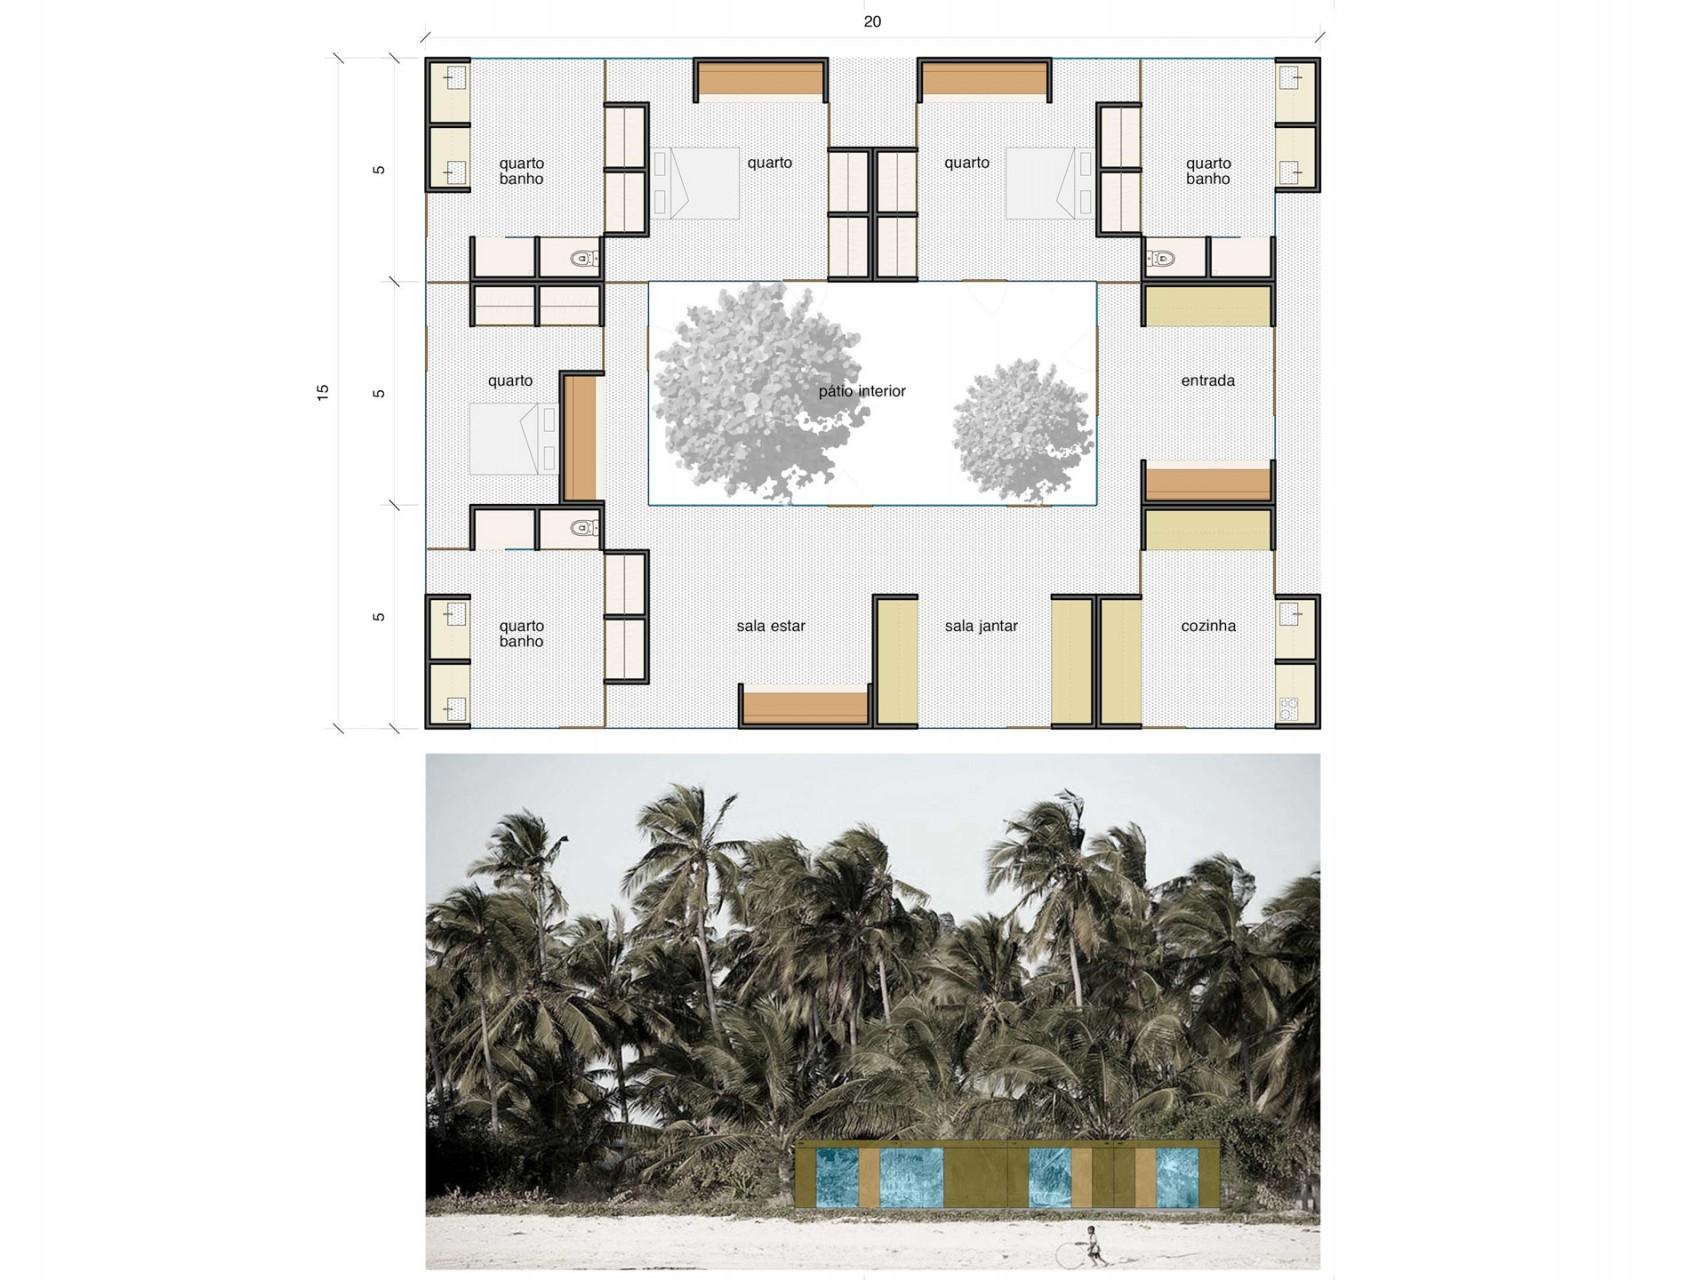 04---Módulo-Habitação-tipo-2